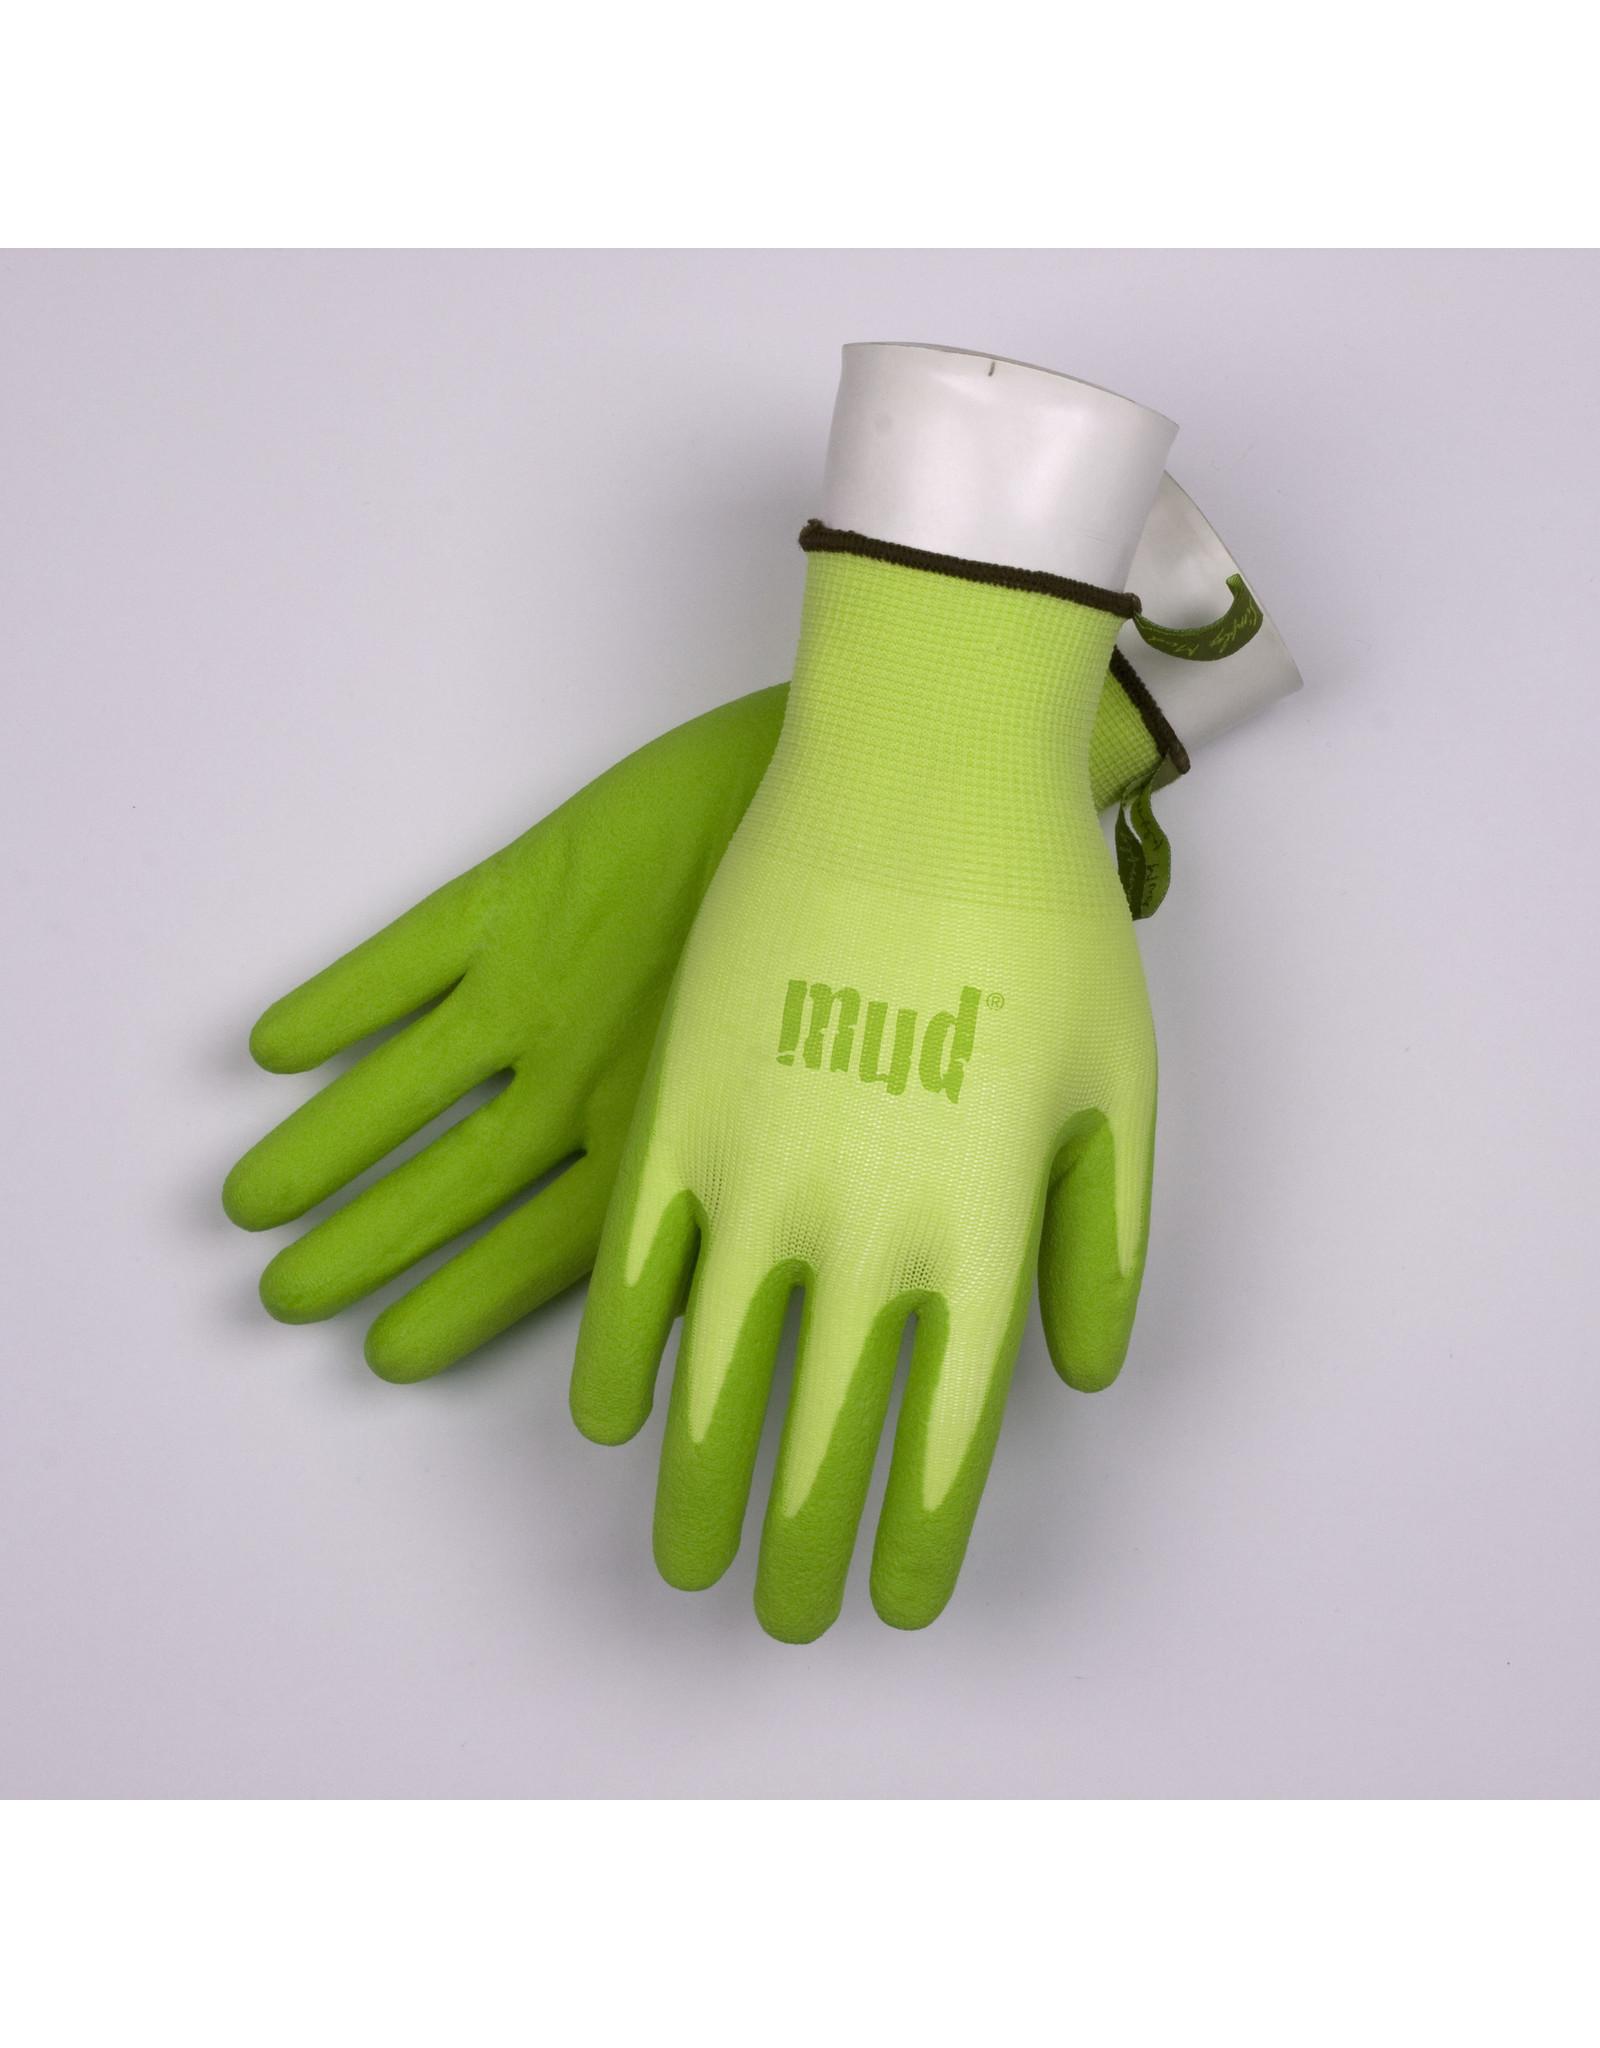 Simply Mud Gloves Kiwi - M